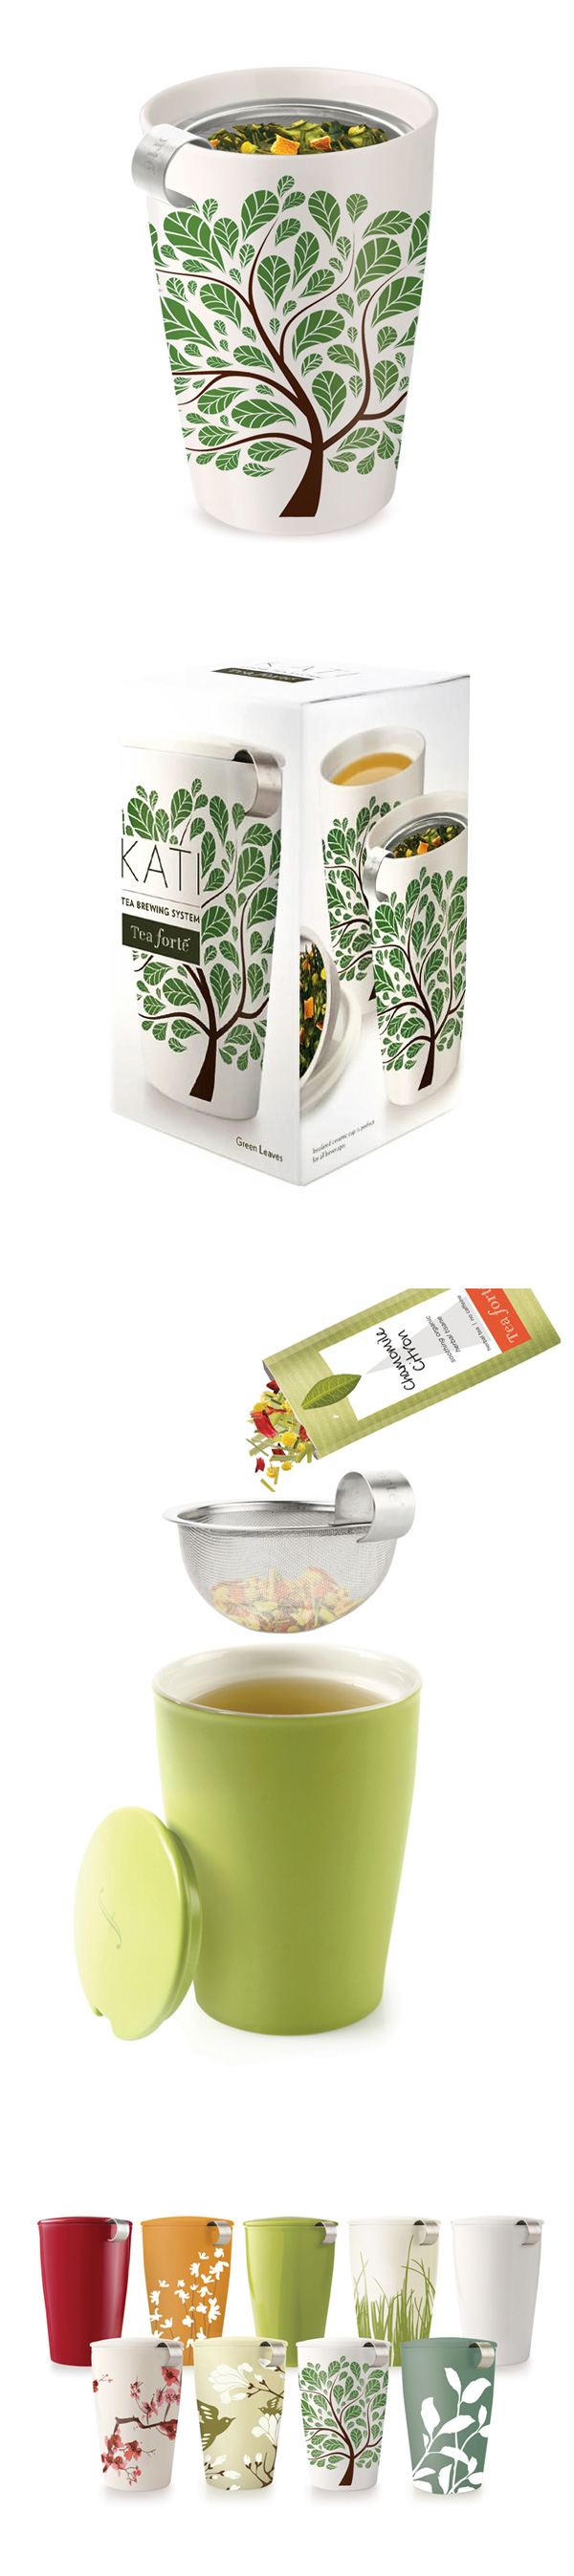 Tea Forte 卡緹茗茶杯 翠葉